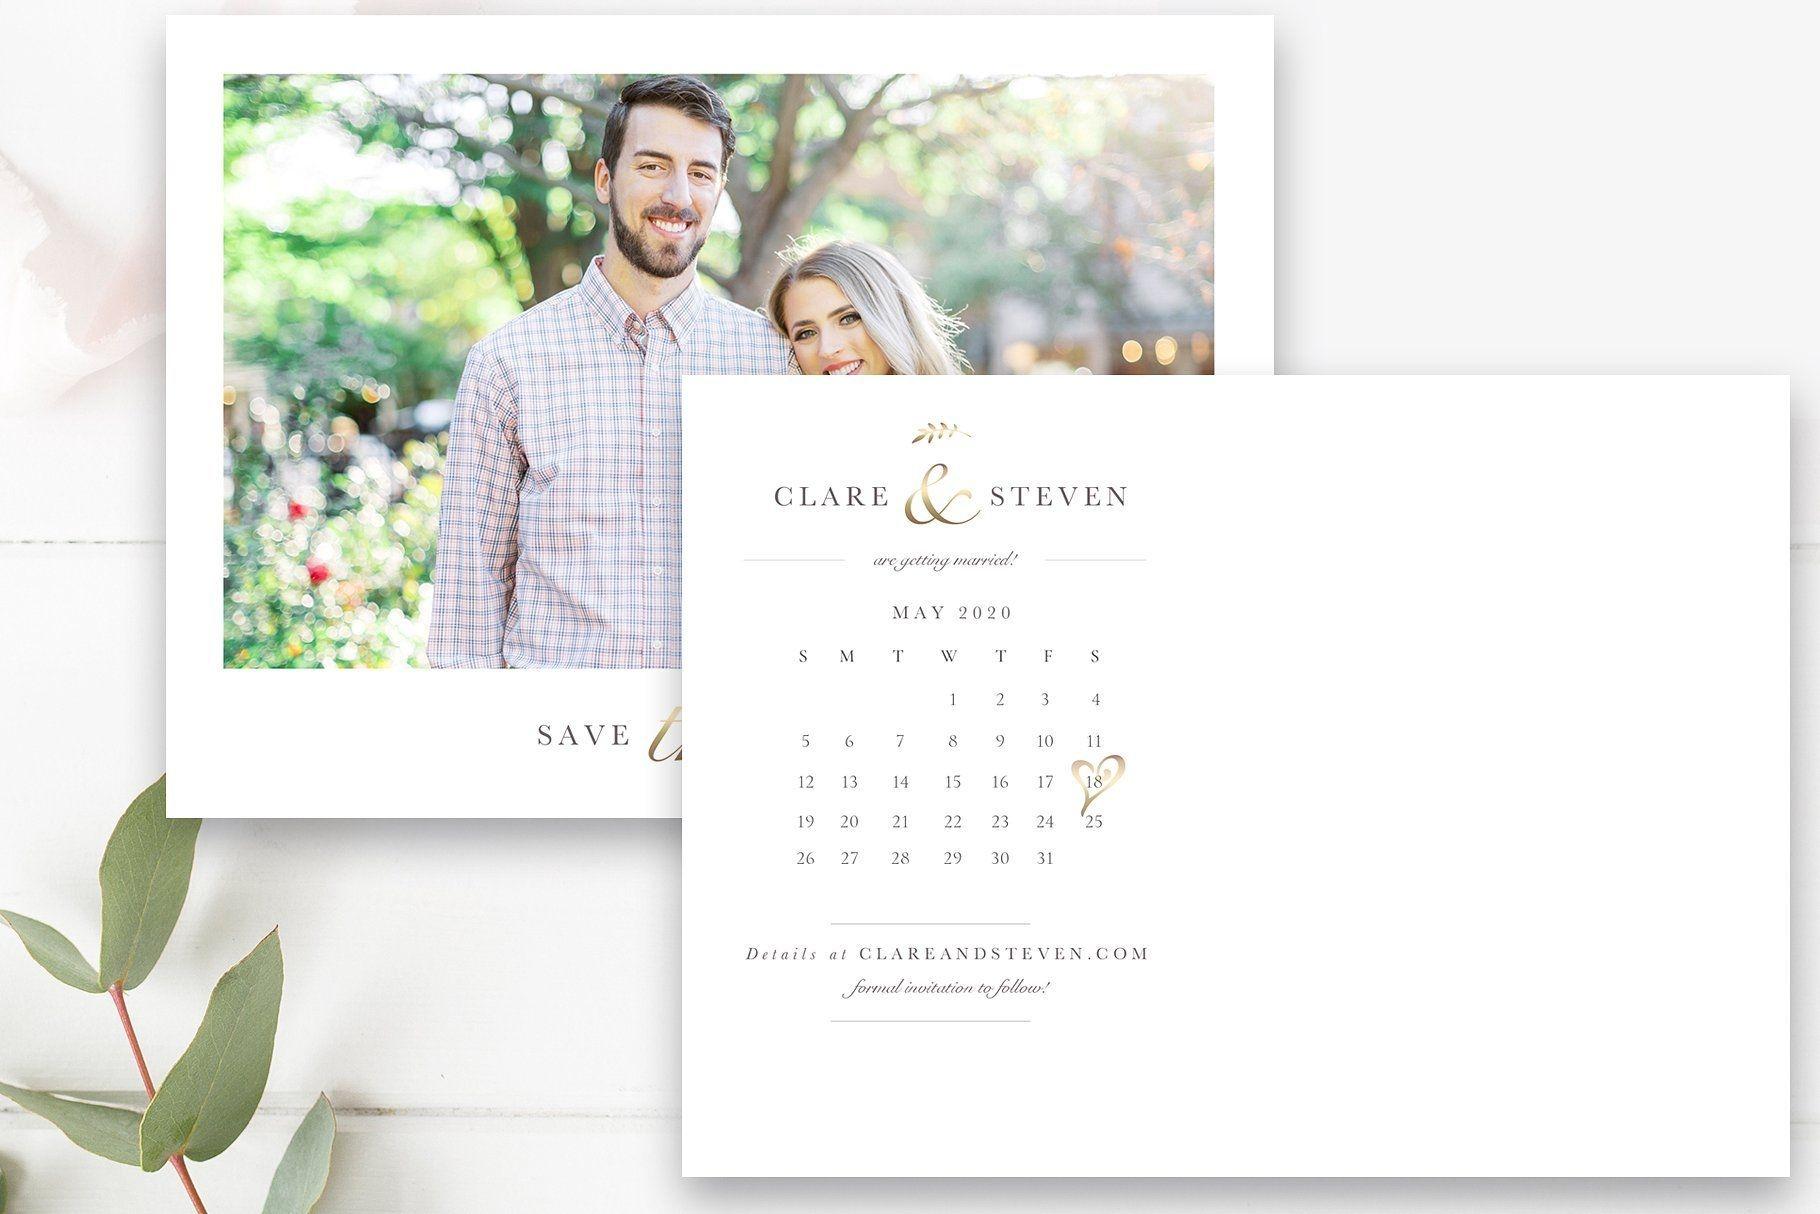 calendar save the date postcard template, 5x7 & 4x6